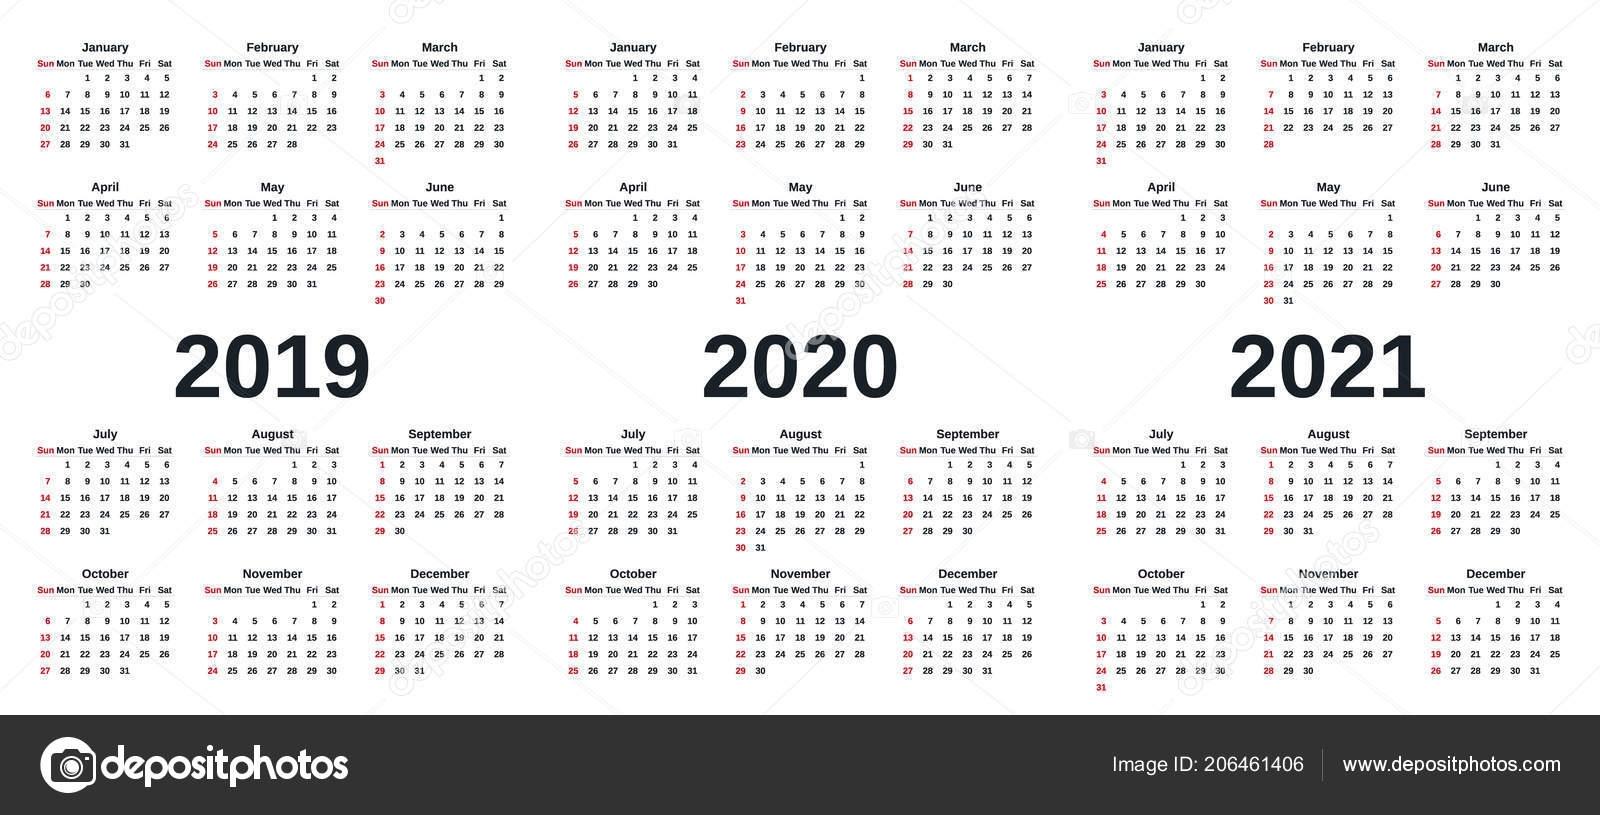 2019 2020 2021 Calendar Vector Graphics Week Starts Sunday Design for Calendar 2019 2020 2021